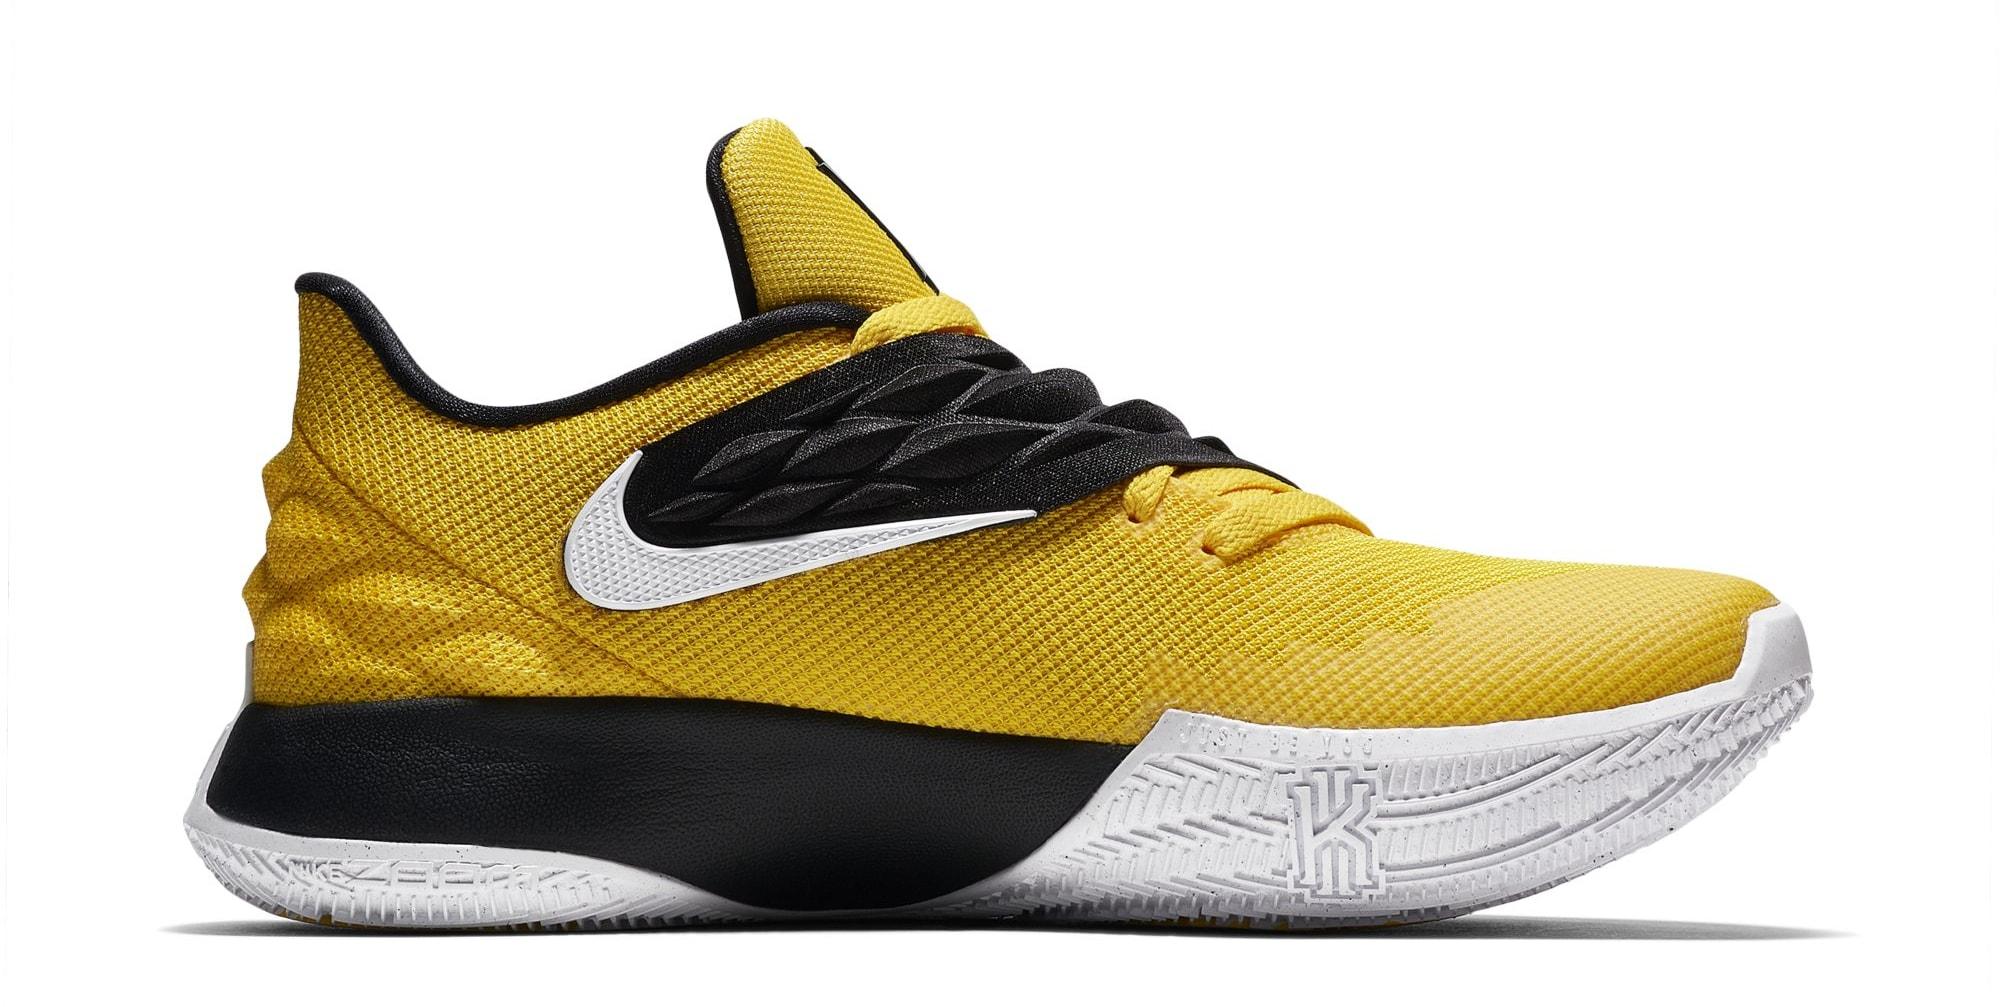 Nike Kyrie Low 'Amarillo/Black' (Medial)